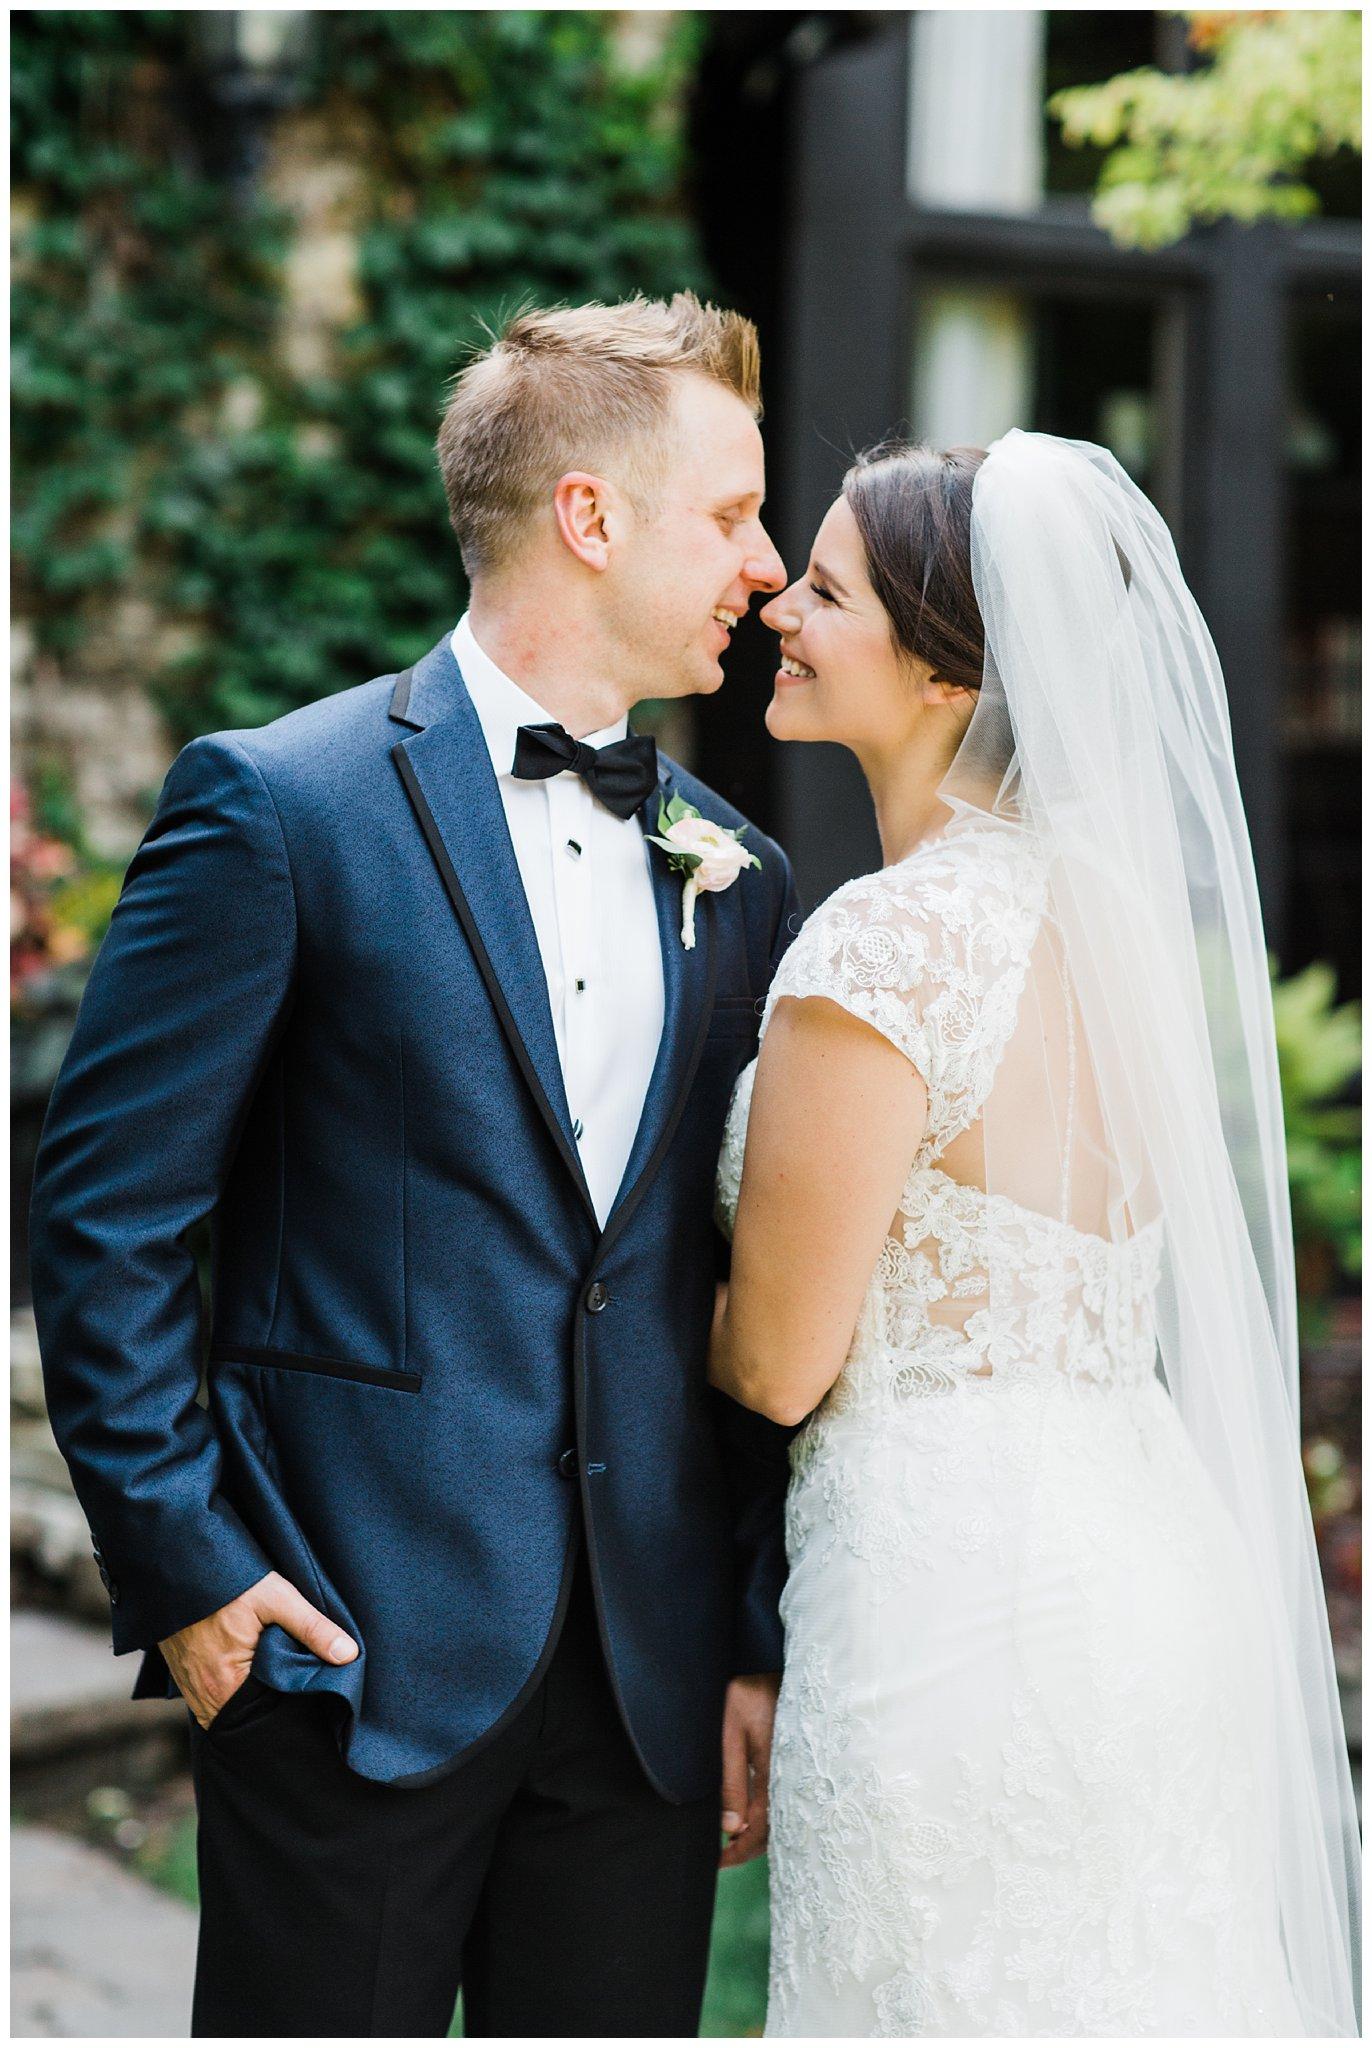 Alicia&Kurt_RavisloeCountryClubWedding_Chicagoweddingphotographer_RebeccaHaleyPhotography_0163.jpg